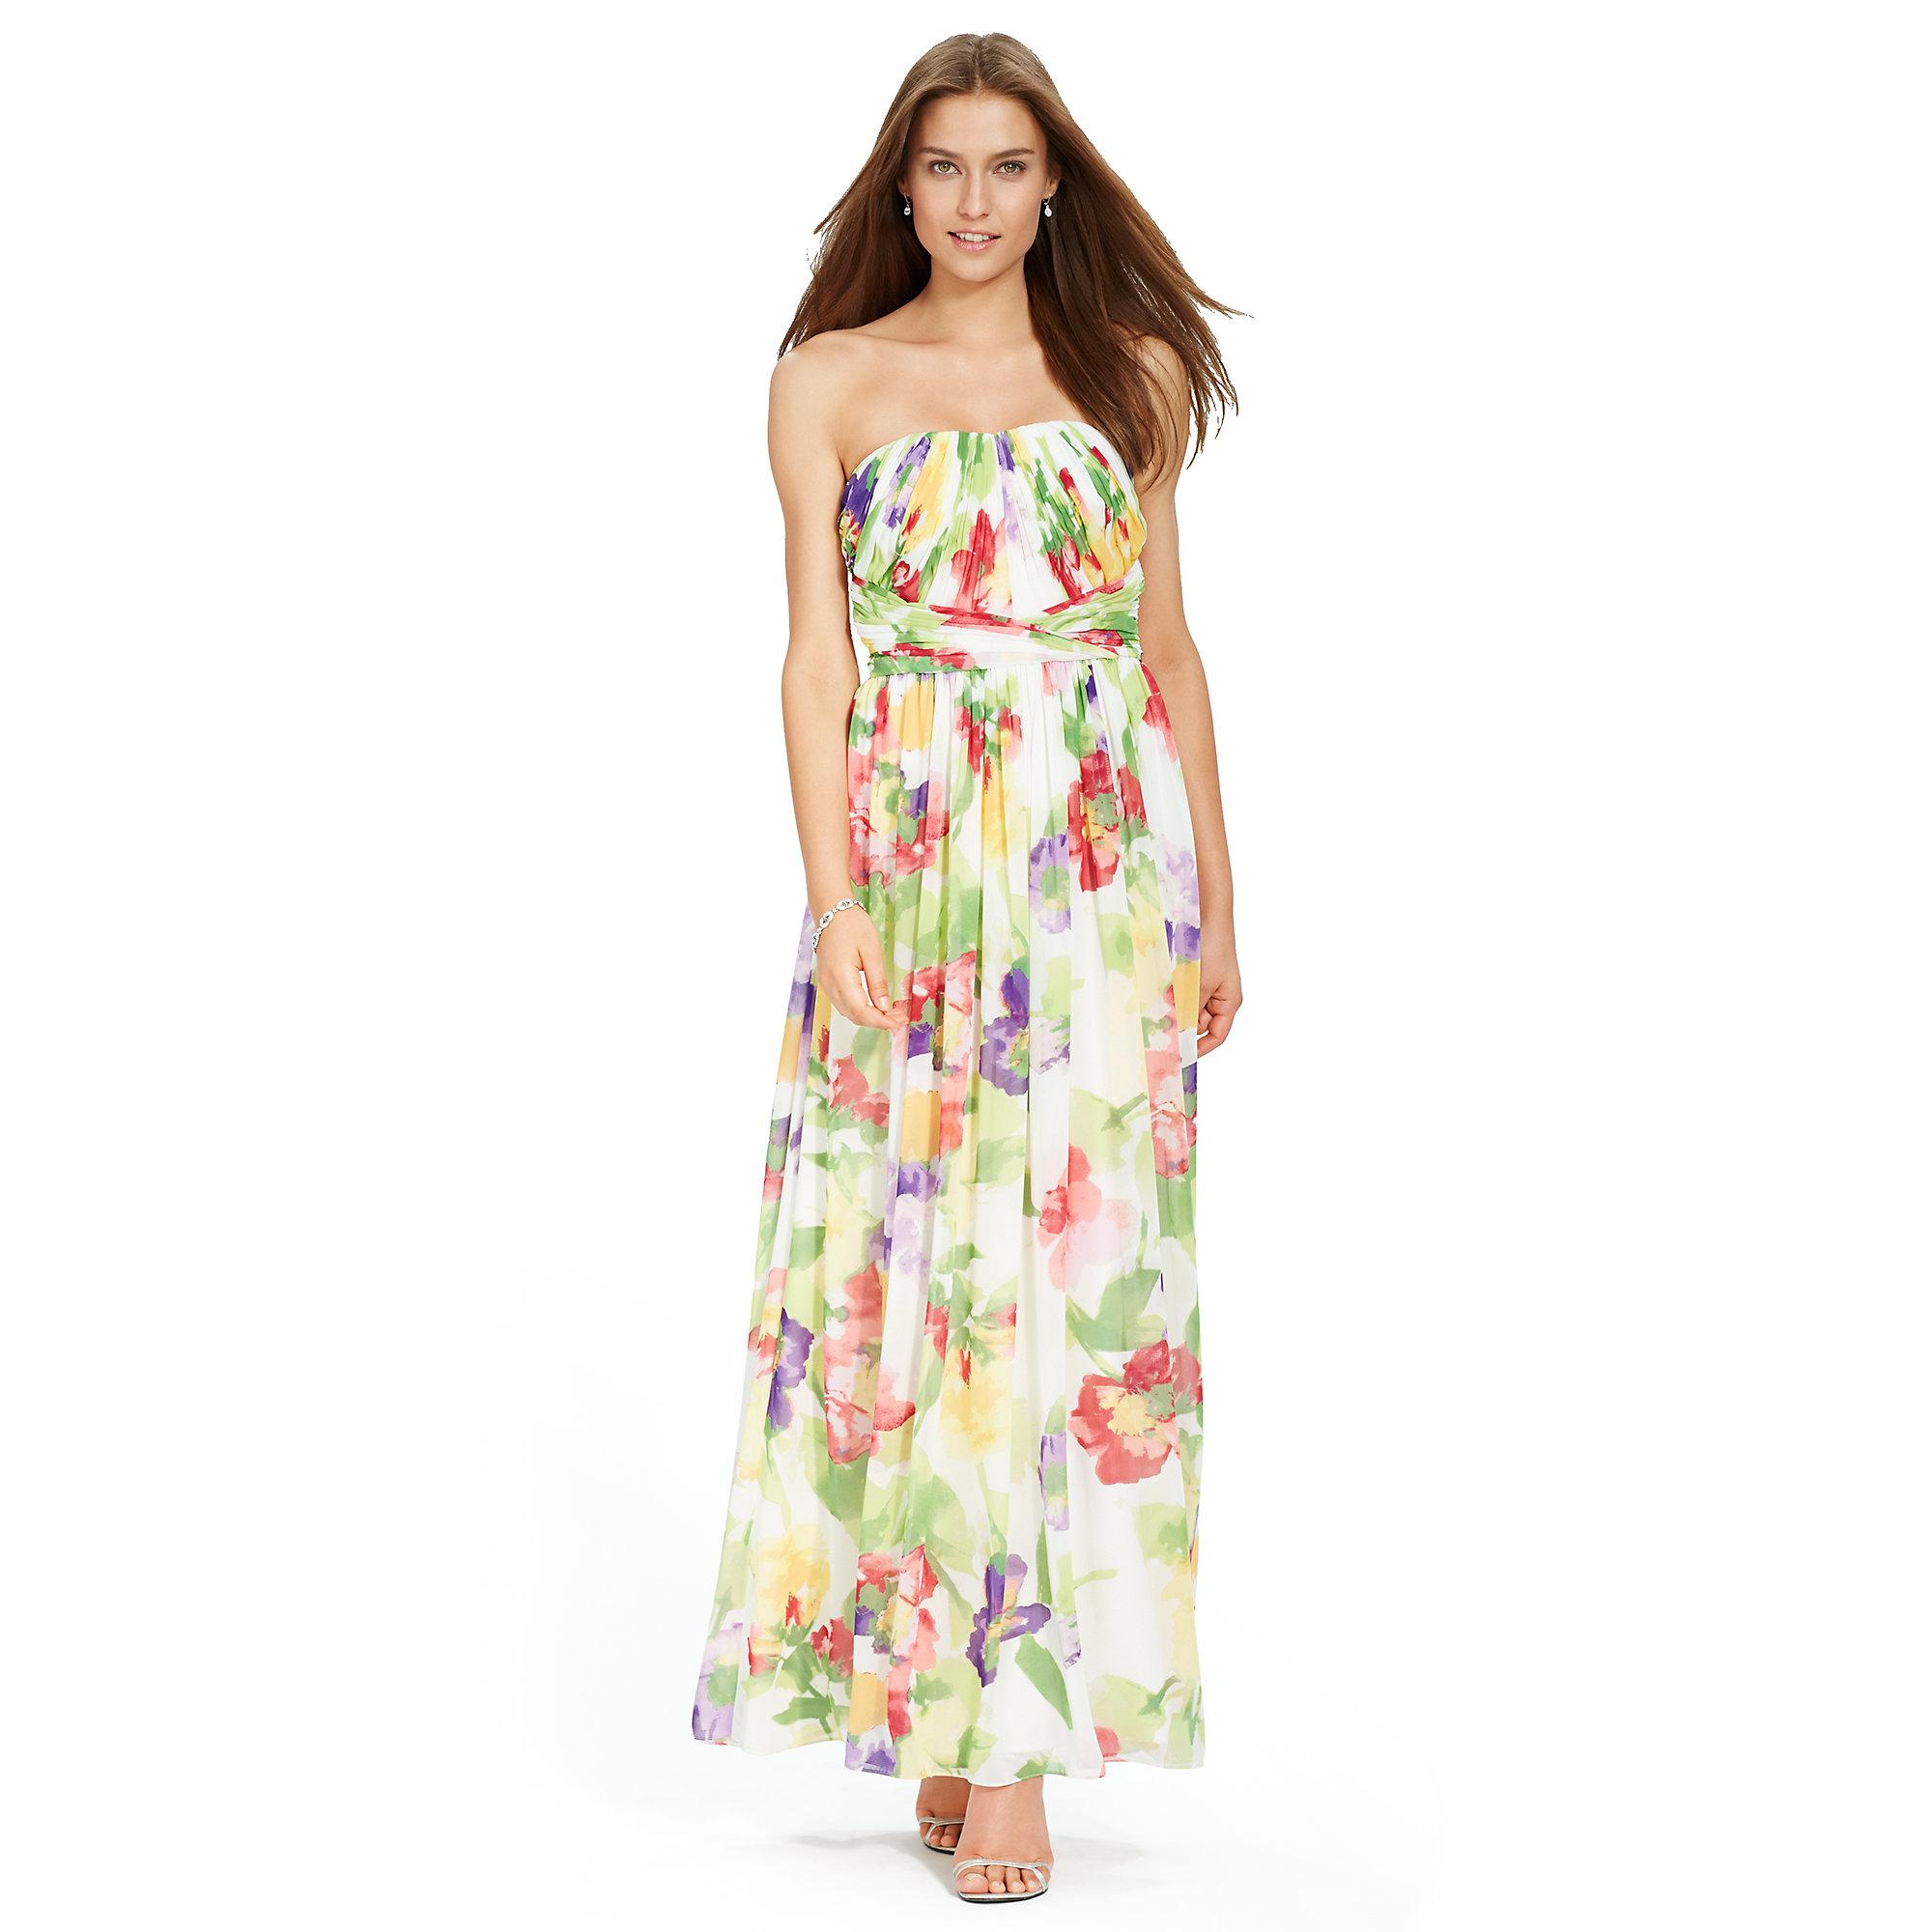 Lyst - Ralph Lauren Floral Empire-waist Gown